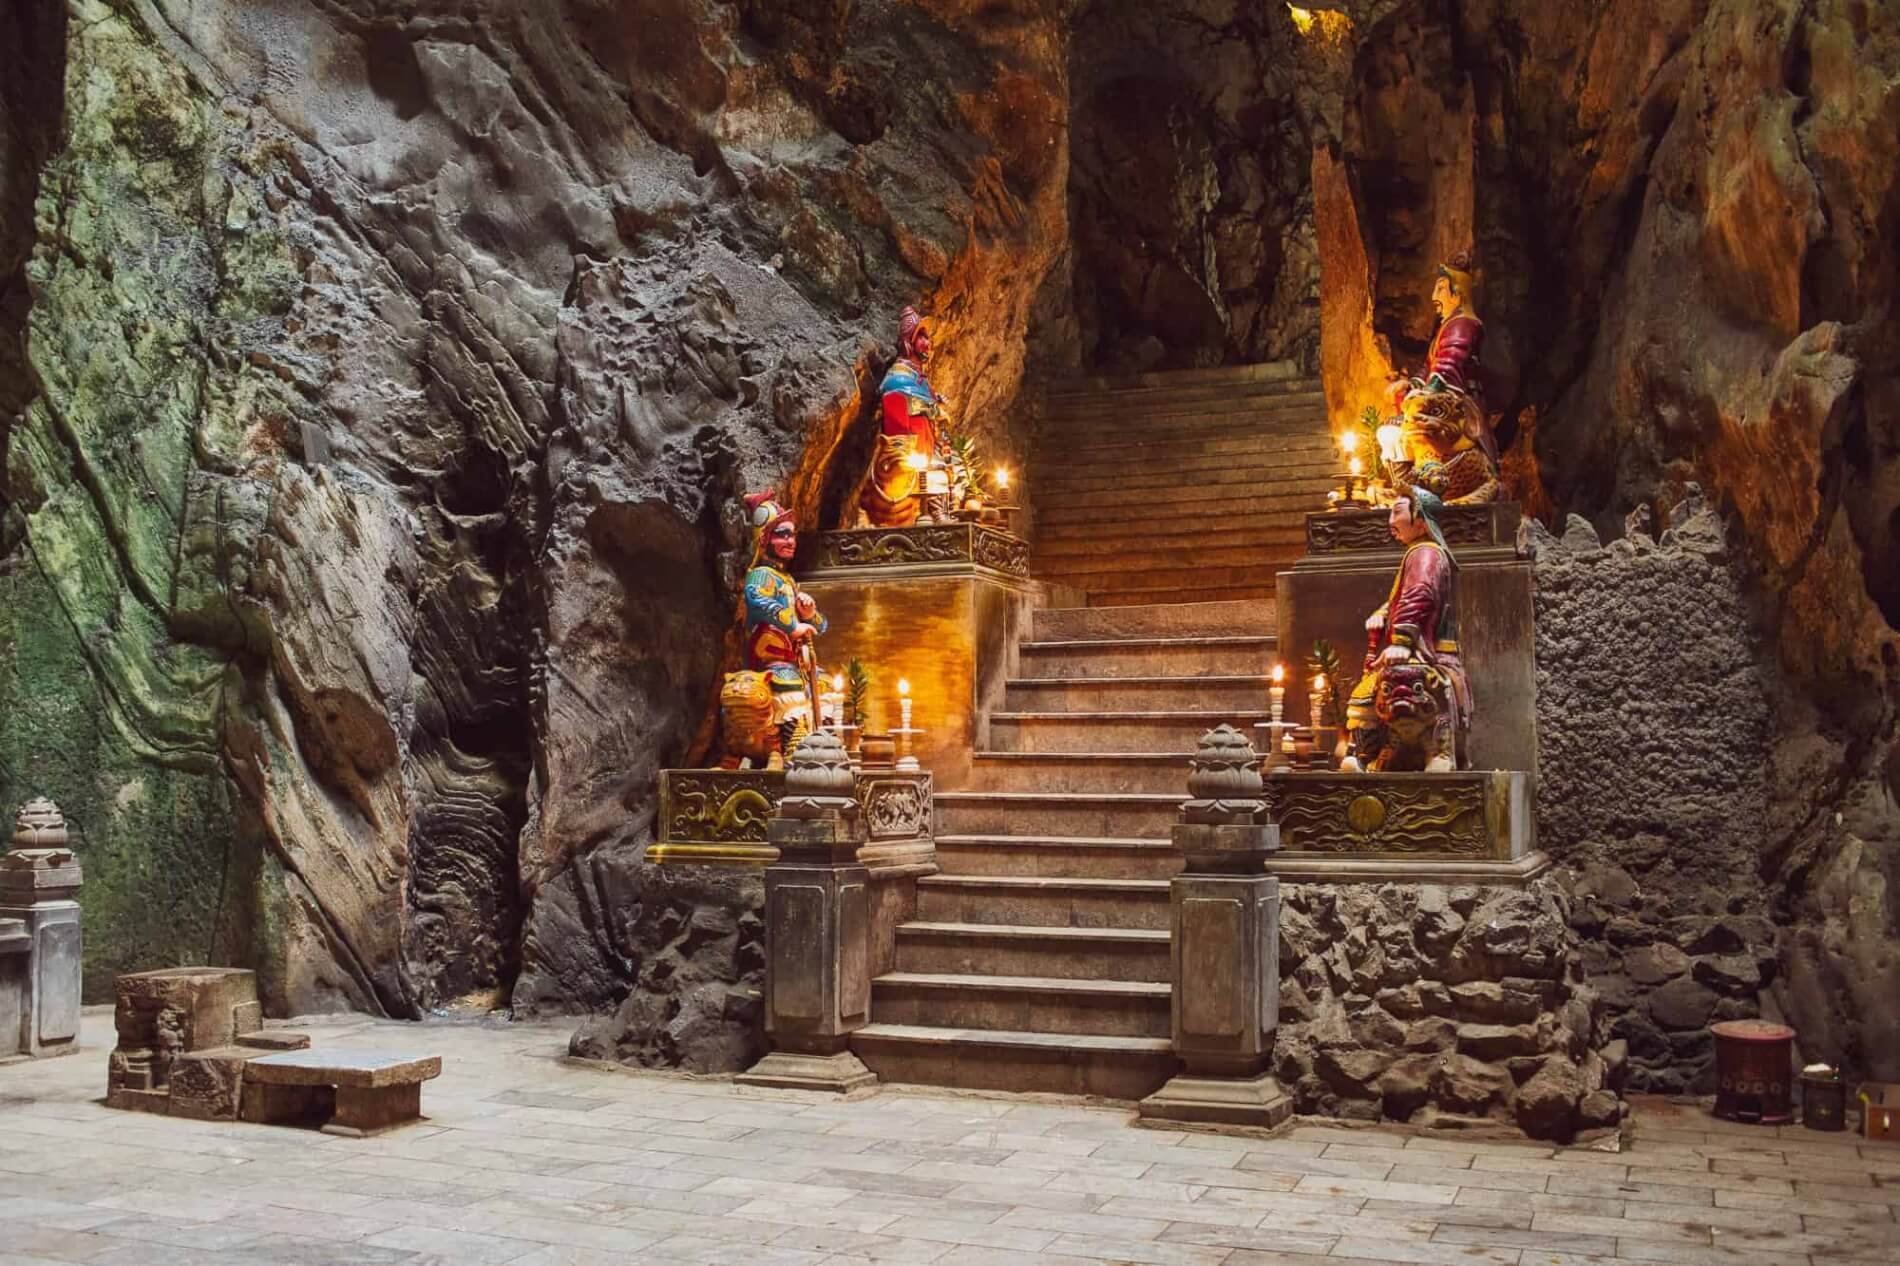 Marble Mountains - Huyen Khong Cave